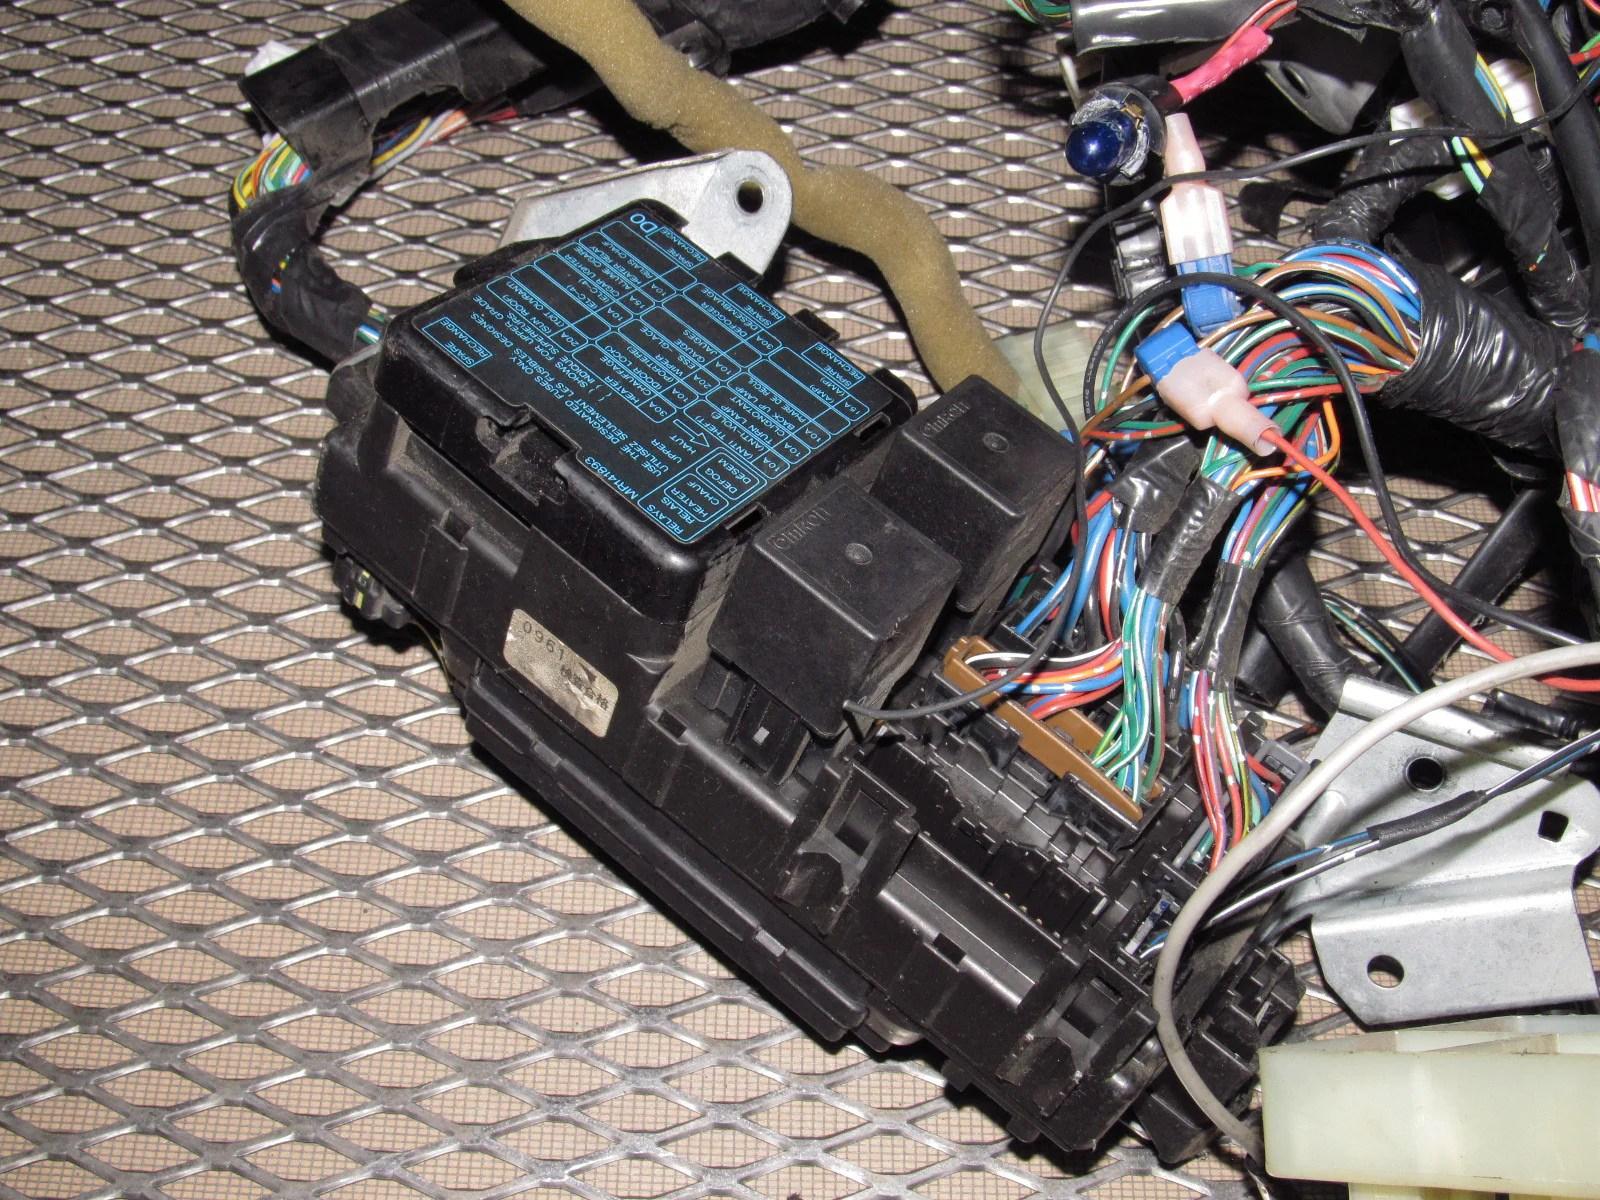 97 98 99 mitsubishi eclipse oem interior dash trunk wiring harness 97 98 99 mitsubishi [ 1600 x 1200 Pixel ]